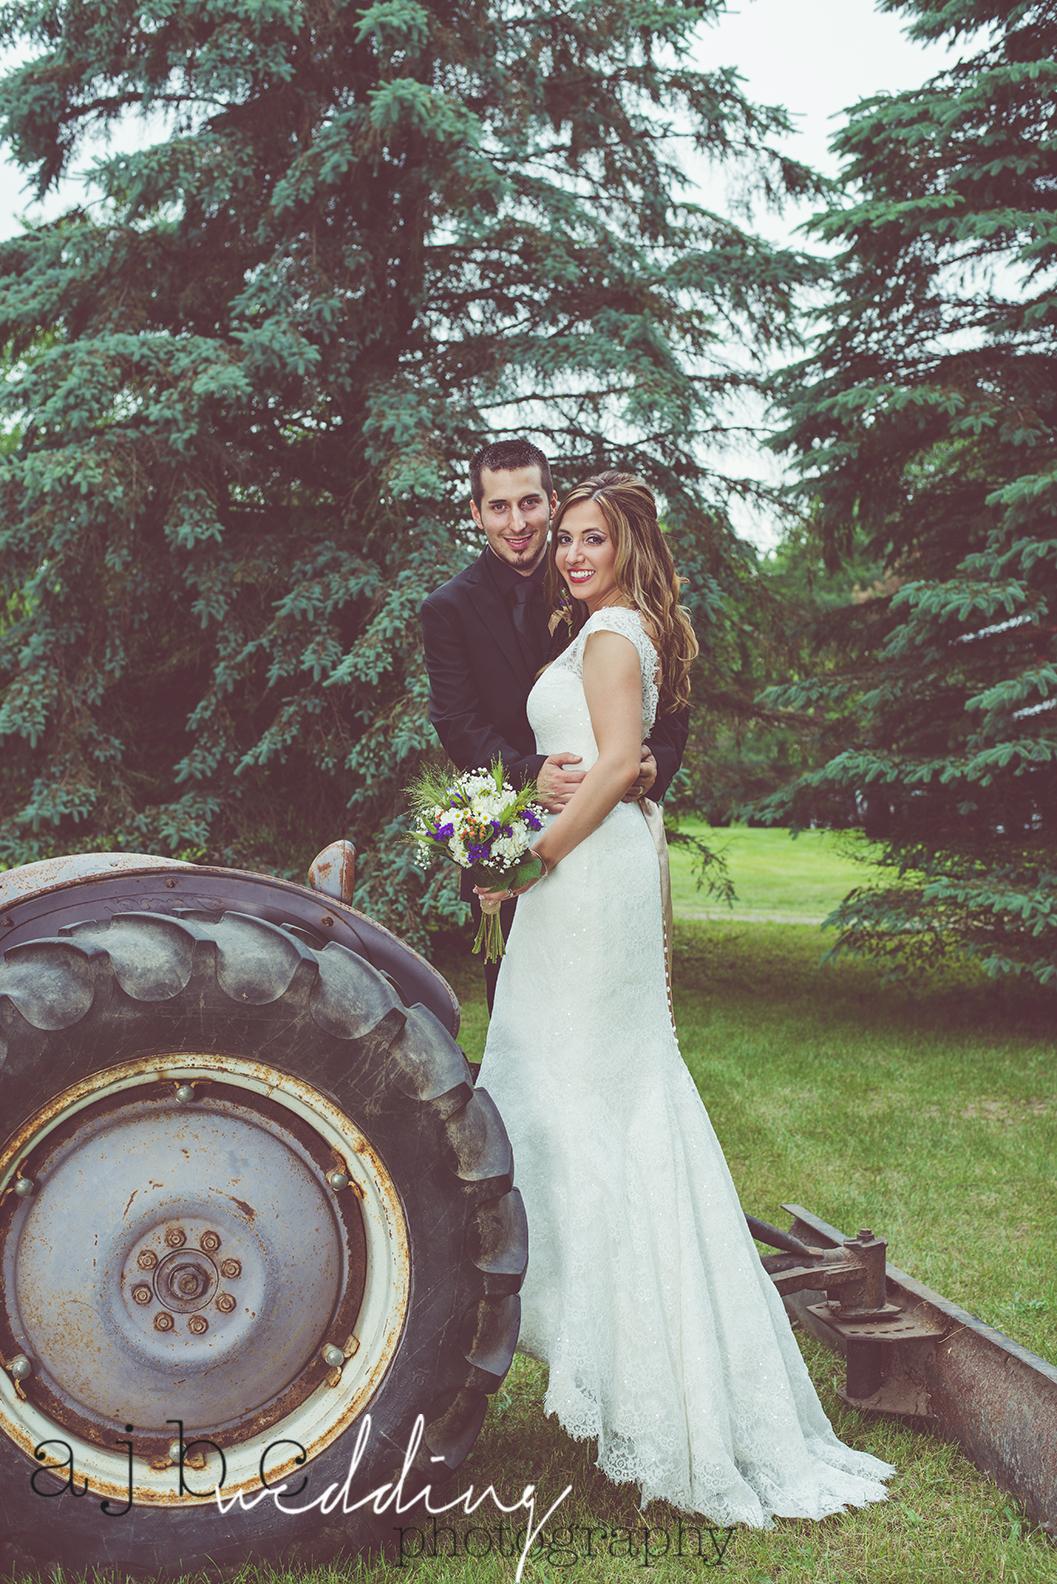 ajbcphotography-port-huron-michigan-wedding-photographer-outdoors-summer-wedding-country-wedding-wadhams-michigan-bride-vintage-wedding-tractor.jpg